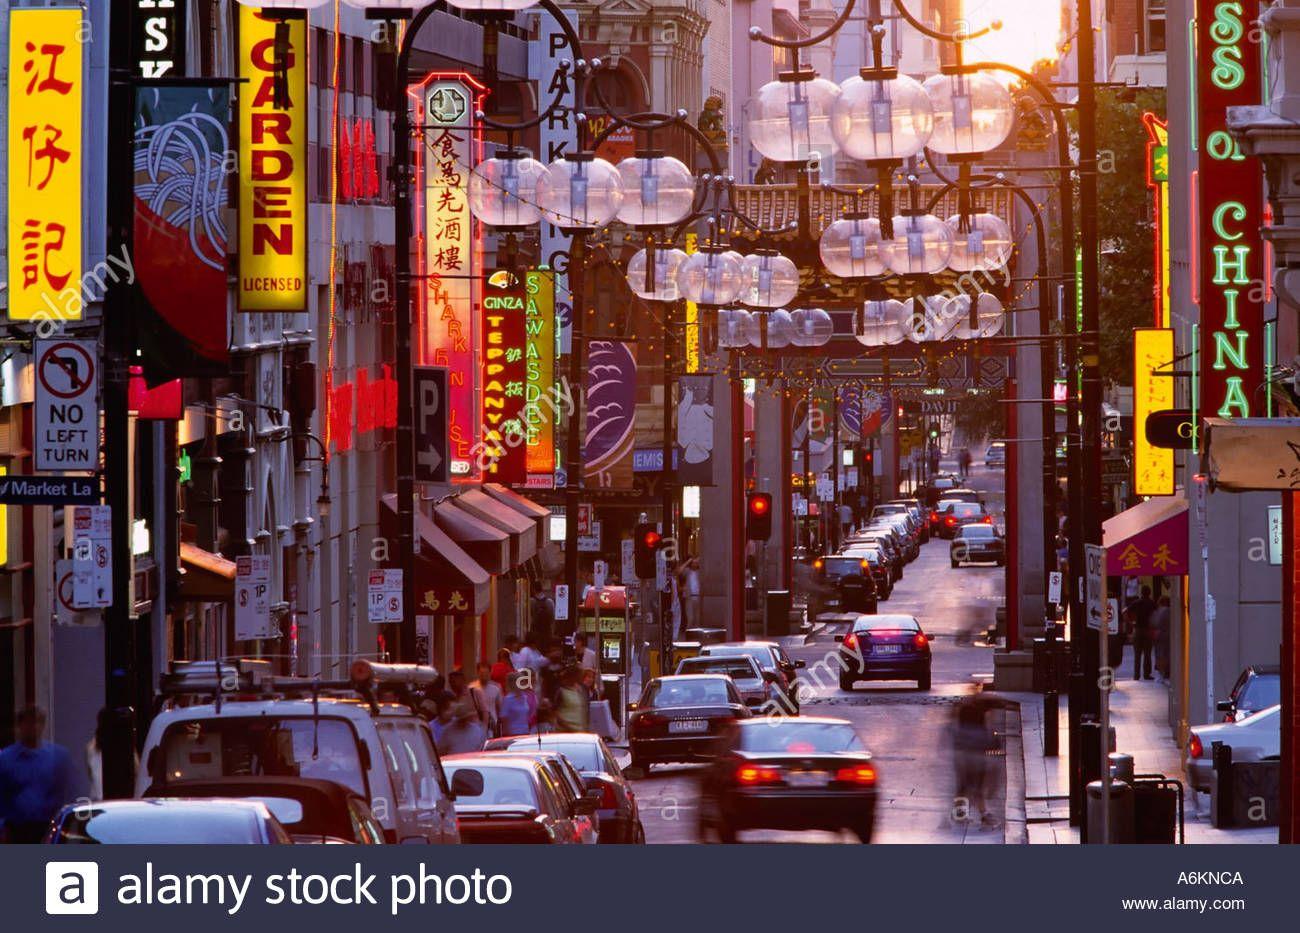 Little Bourke Street Chinatown Melbourne Australia A6knca Jpg 1300 933 Melbourne Australia Melbourne Chinatown